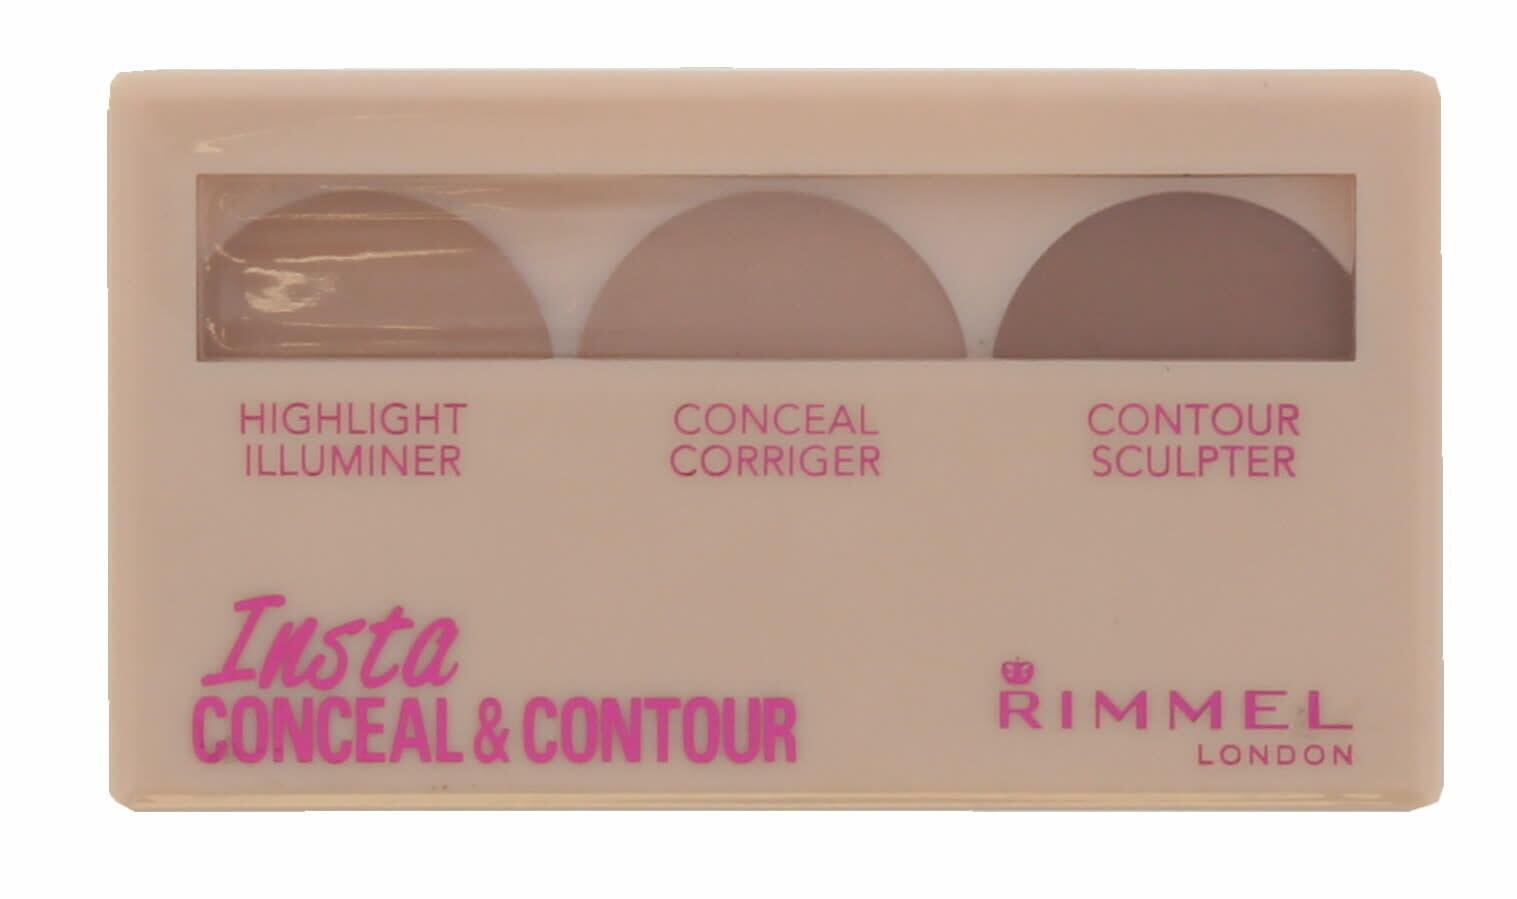 Rimmel Insta - Highlighter, Concealer & Contour Palette - Shade Medium